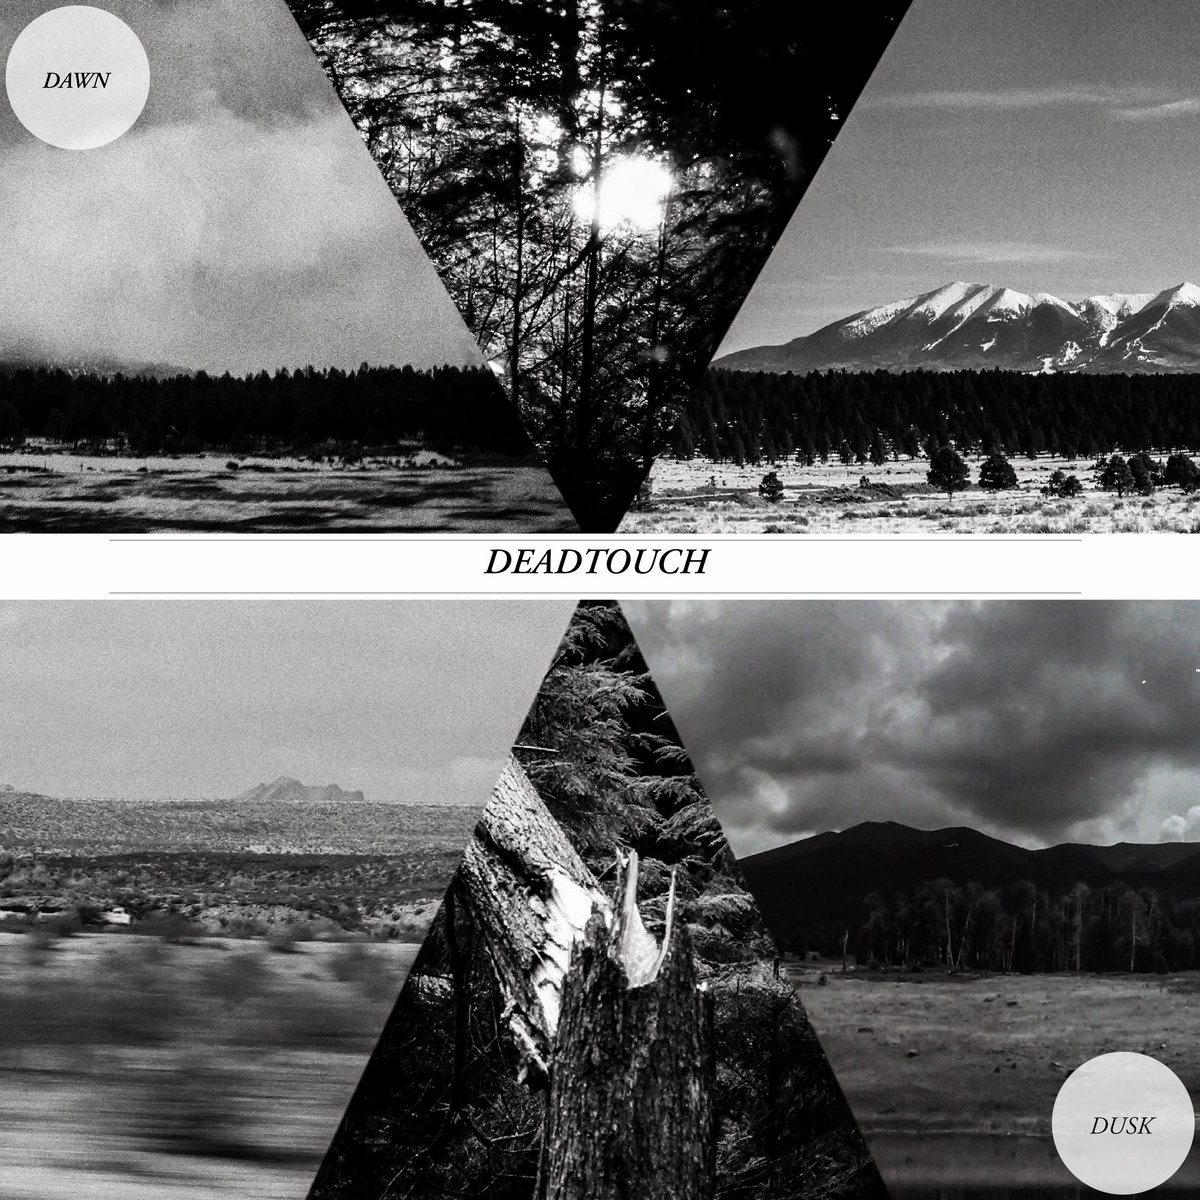 https://deadtouch.bandcamp.com/album/dawn-dusk